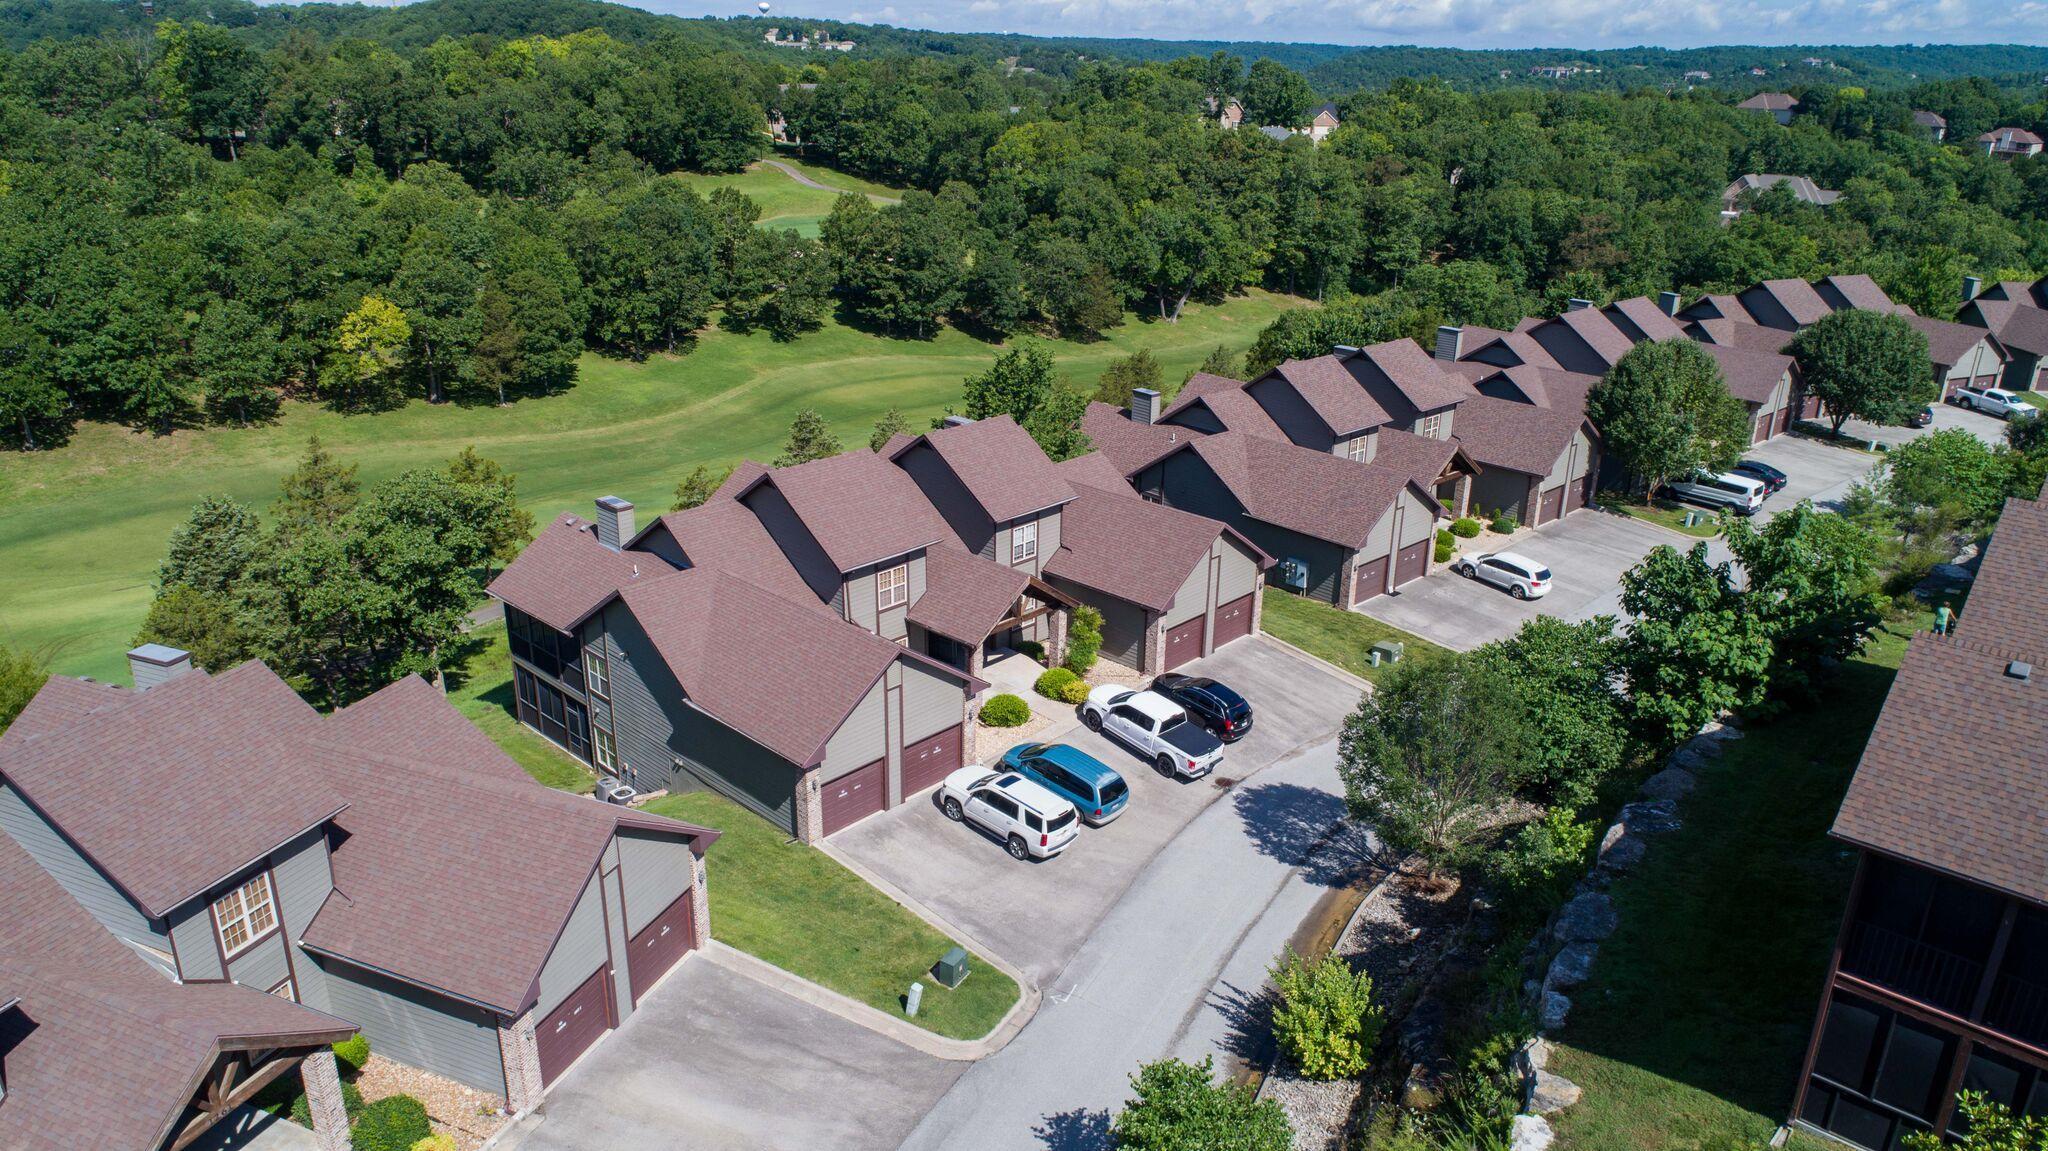 1251 Golf Drive #4 Branson West, MO 65737